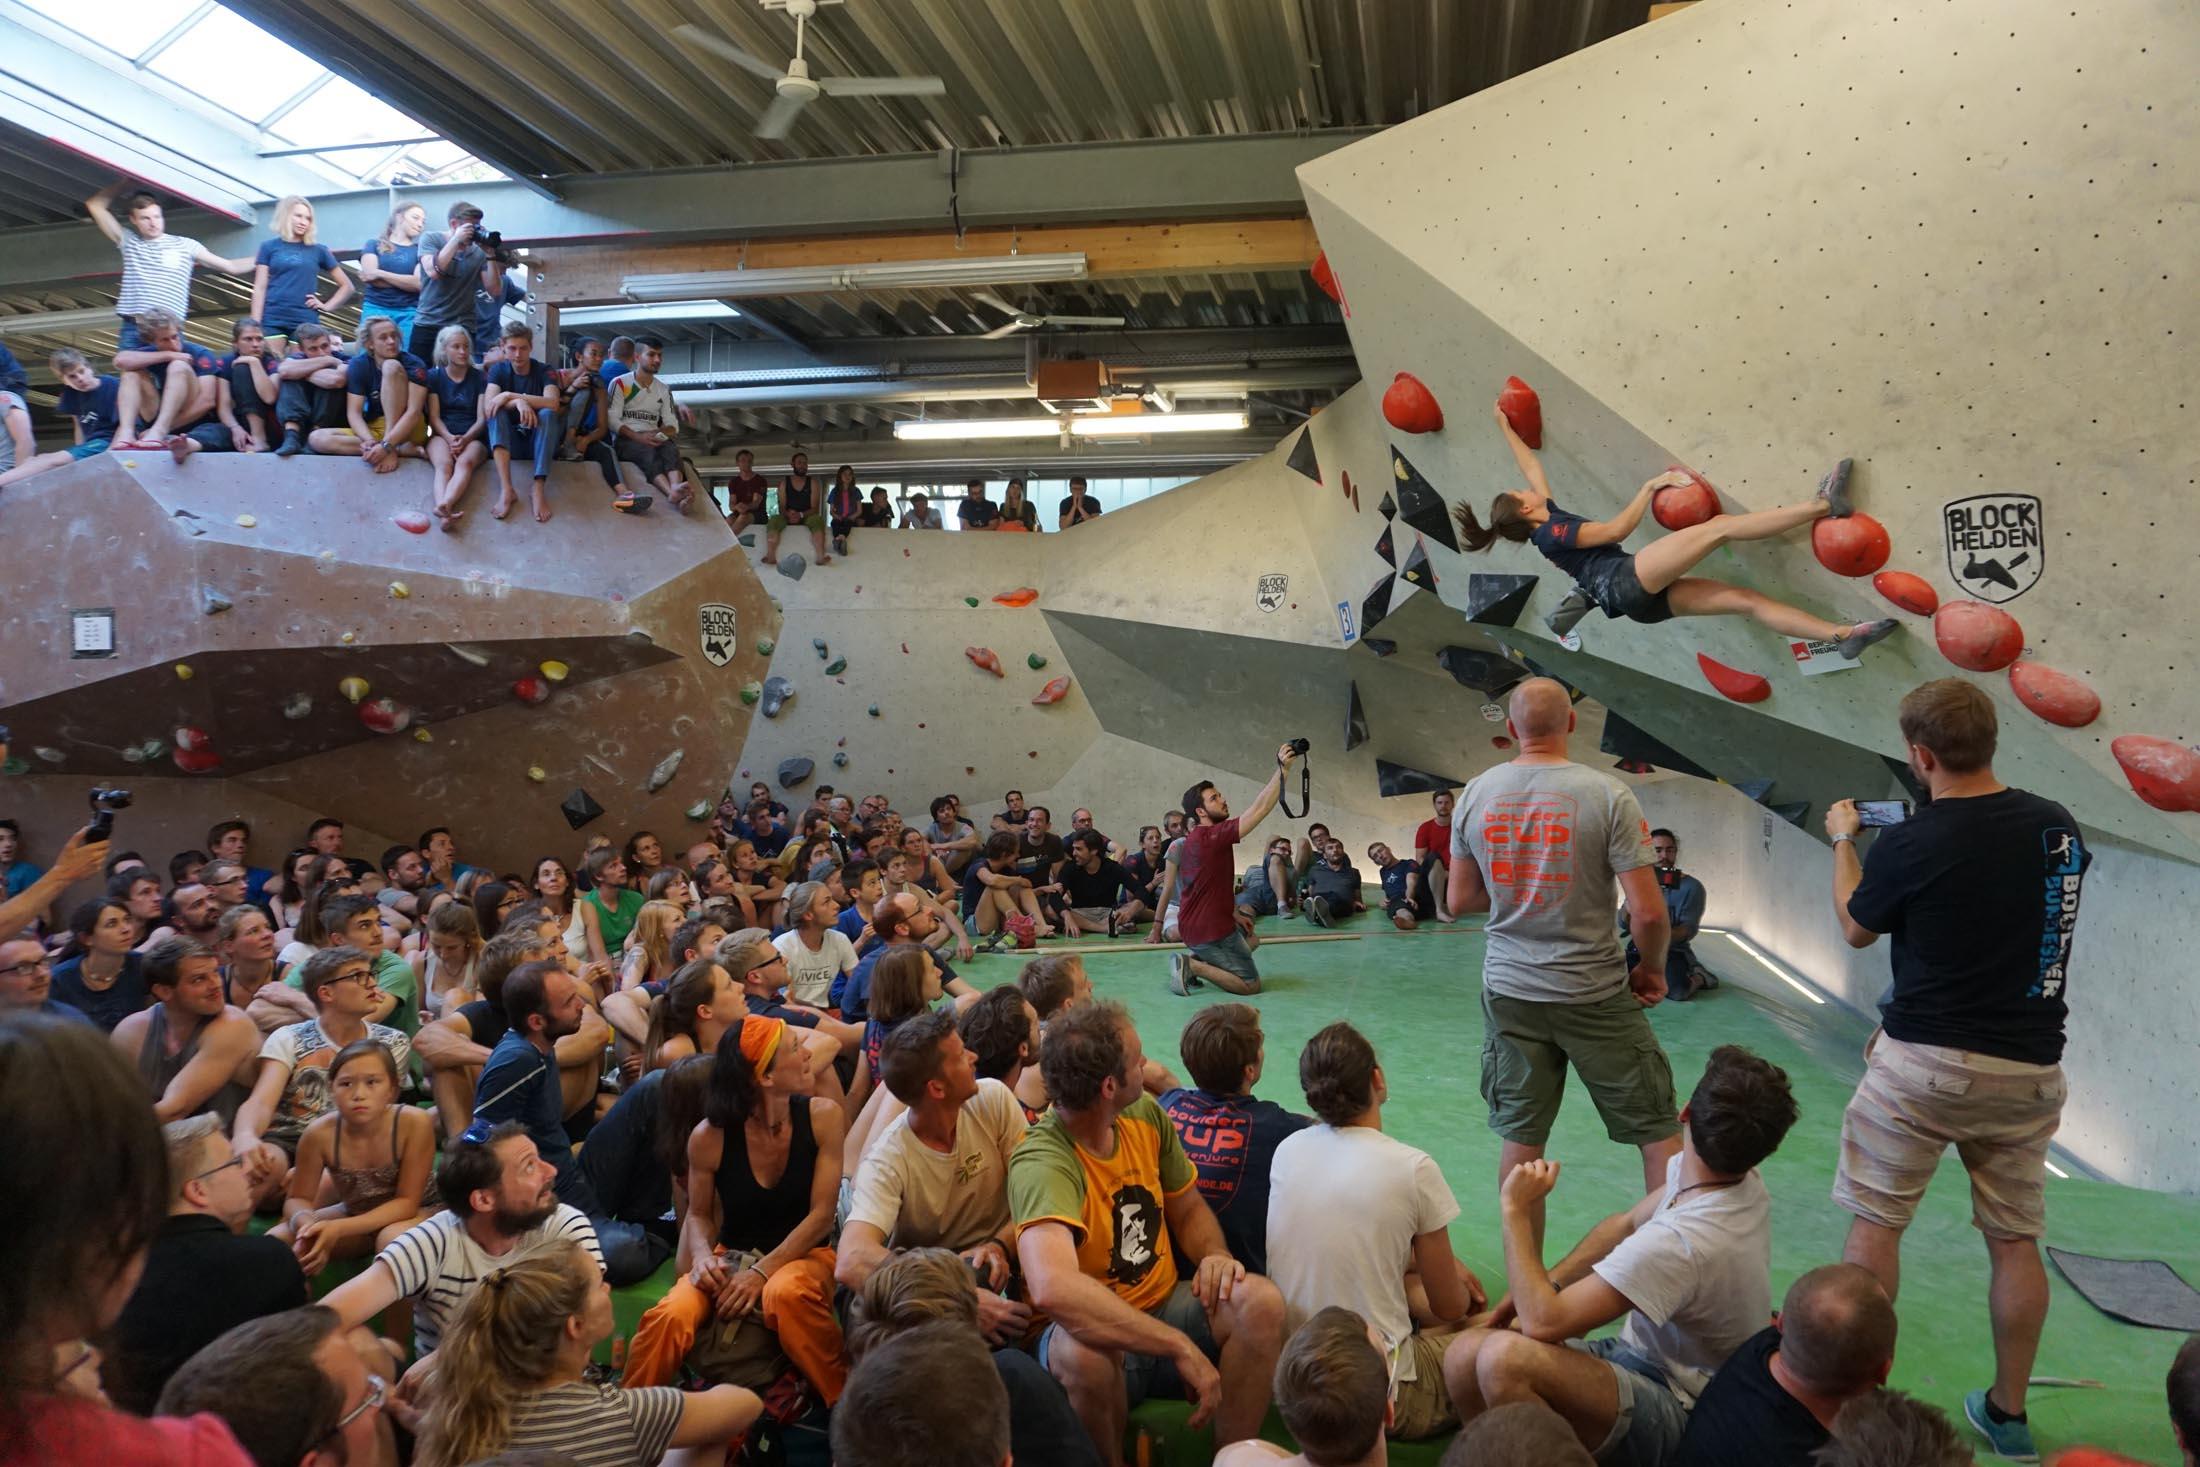 Finale, internationaler bouldercup Frankenjura 2016, BLOCKHELDEN Erlangen, Mammut, Bergfreunde.de, Boulderwettkampf07092016644